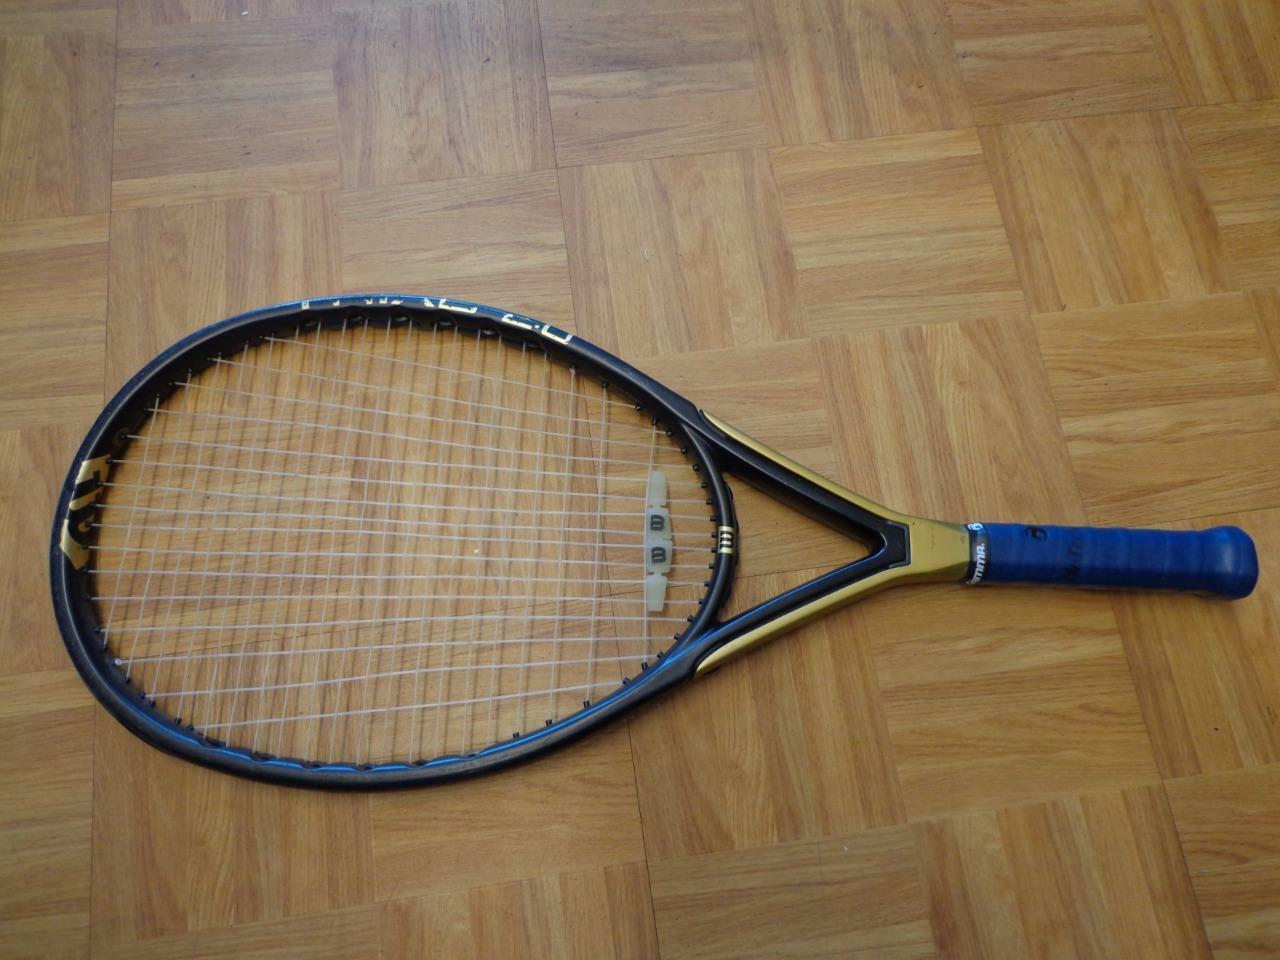 Martillo 2.0 Wilson Triad cabeza de gran tamaño 125 4 3 8 Grip Tenis Raqueta